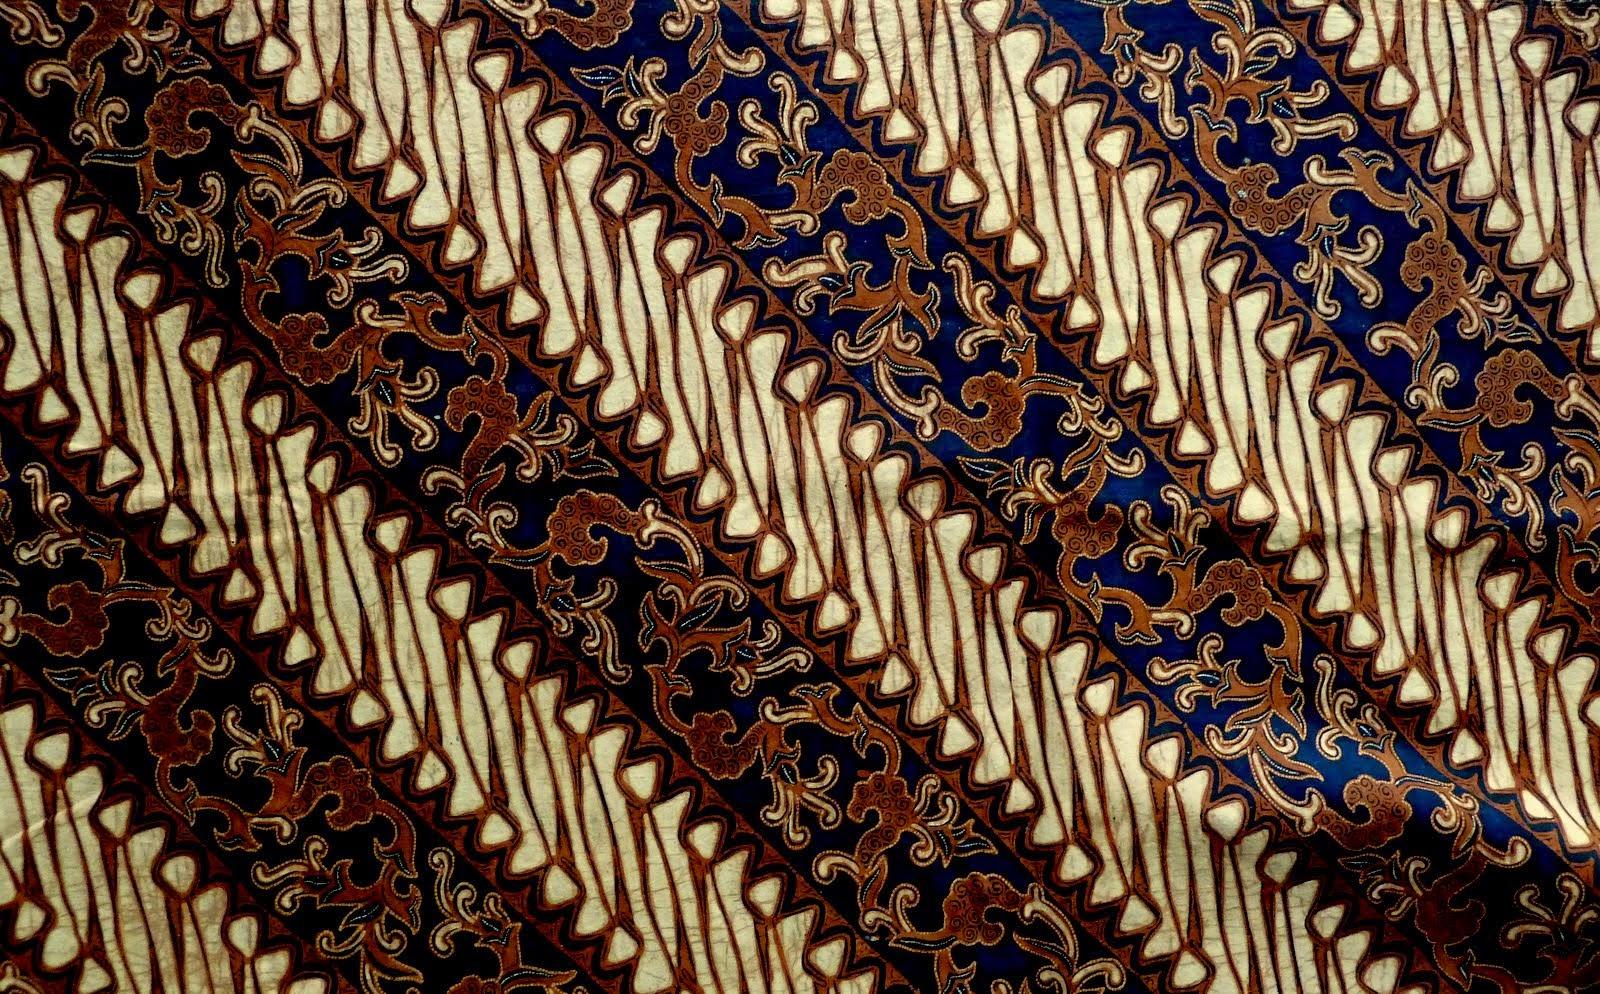 Batik pekalongan motif parang kombinasi